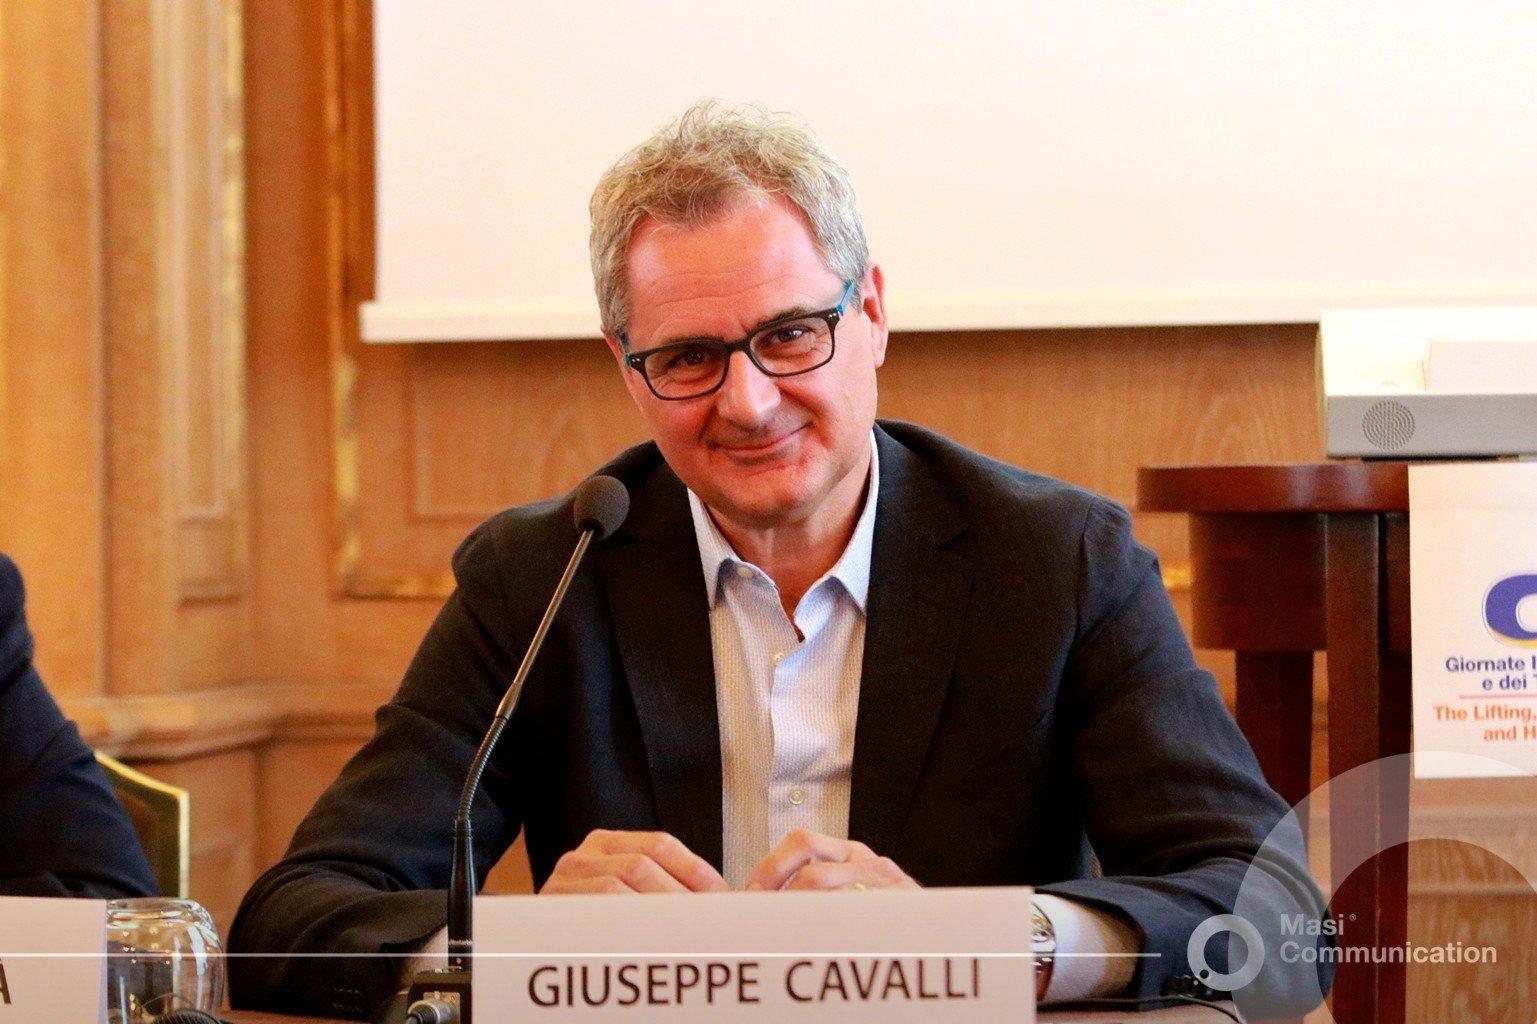 Giuseppe Cavalli, Presidente Piacenza Expo